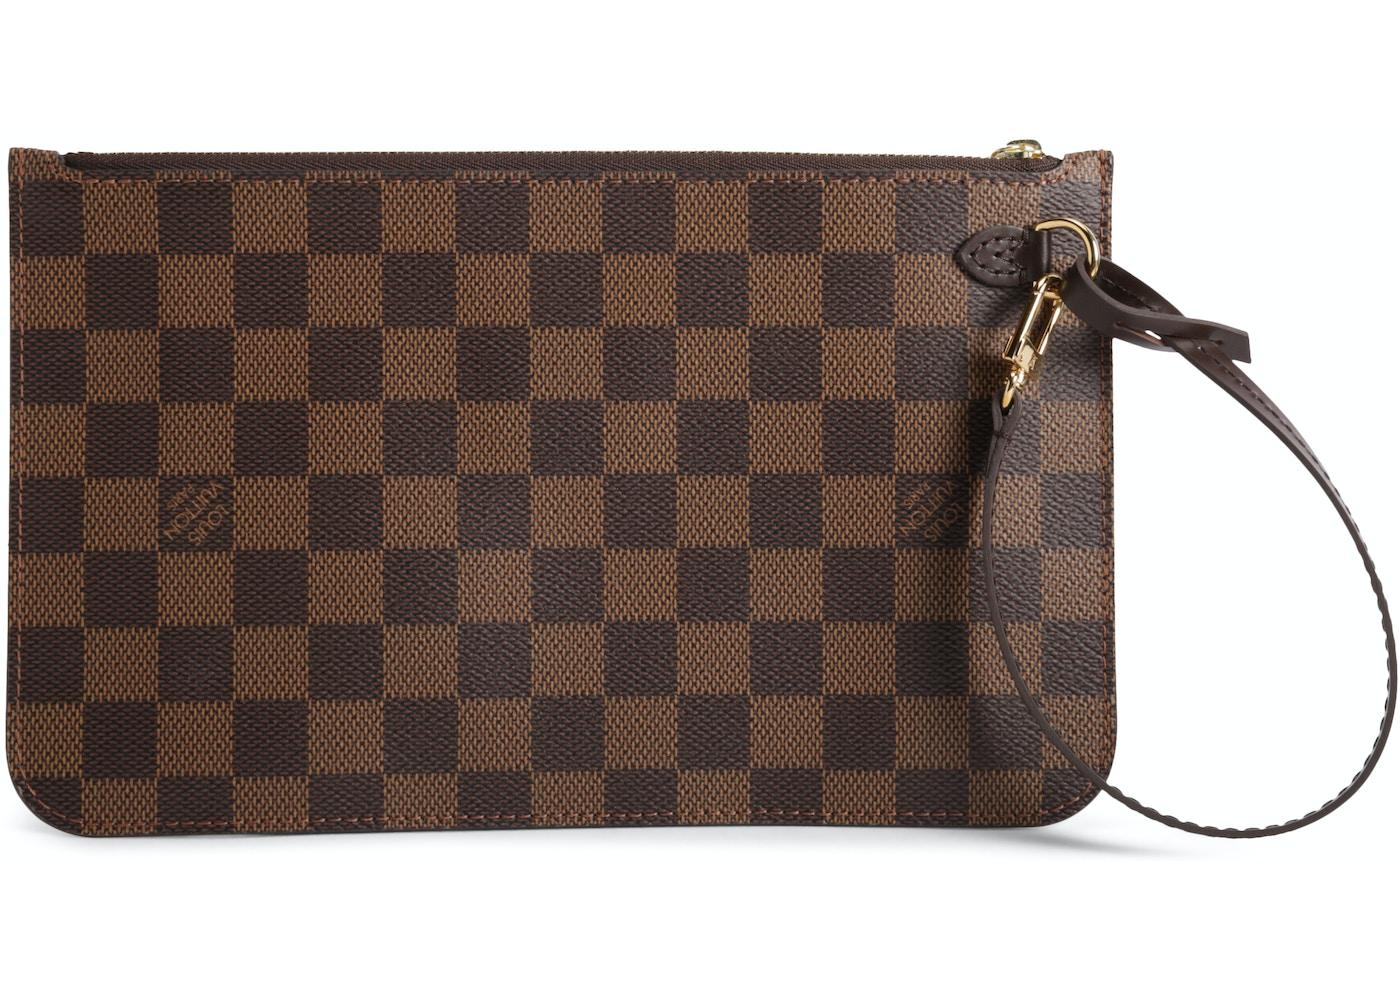 9c60ed2b81 Buy & Sell Louis Vuitton Luxury Handbags